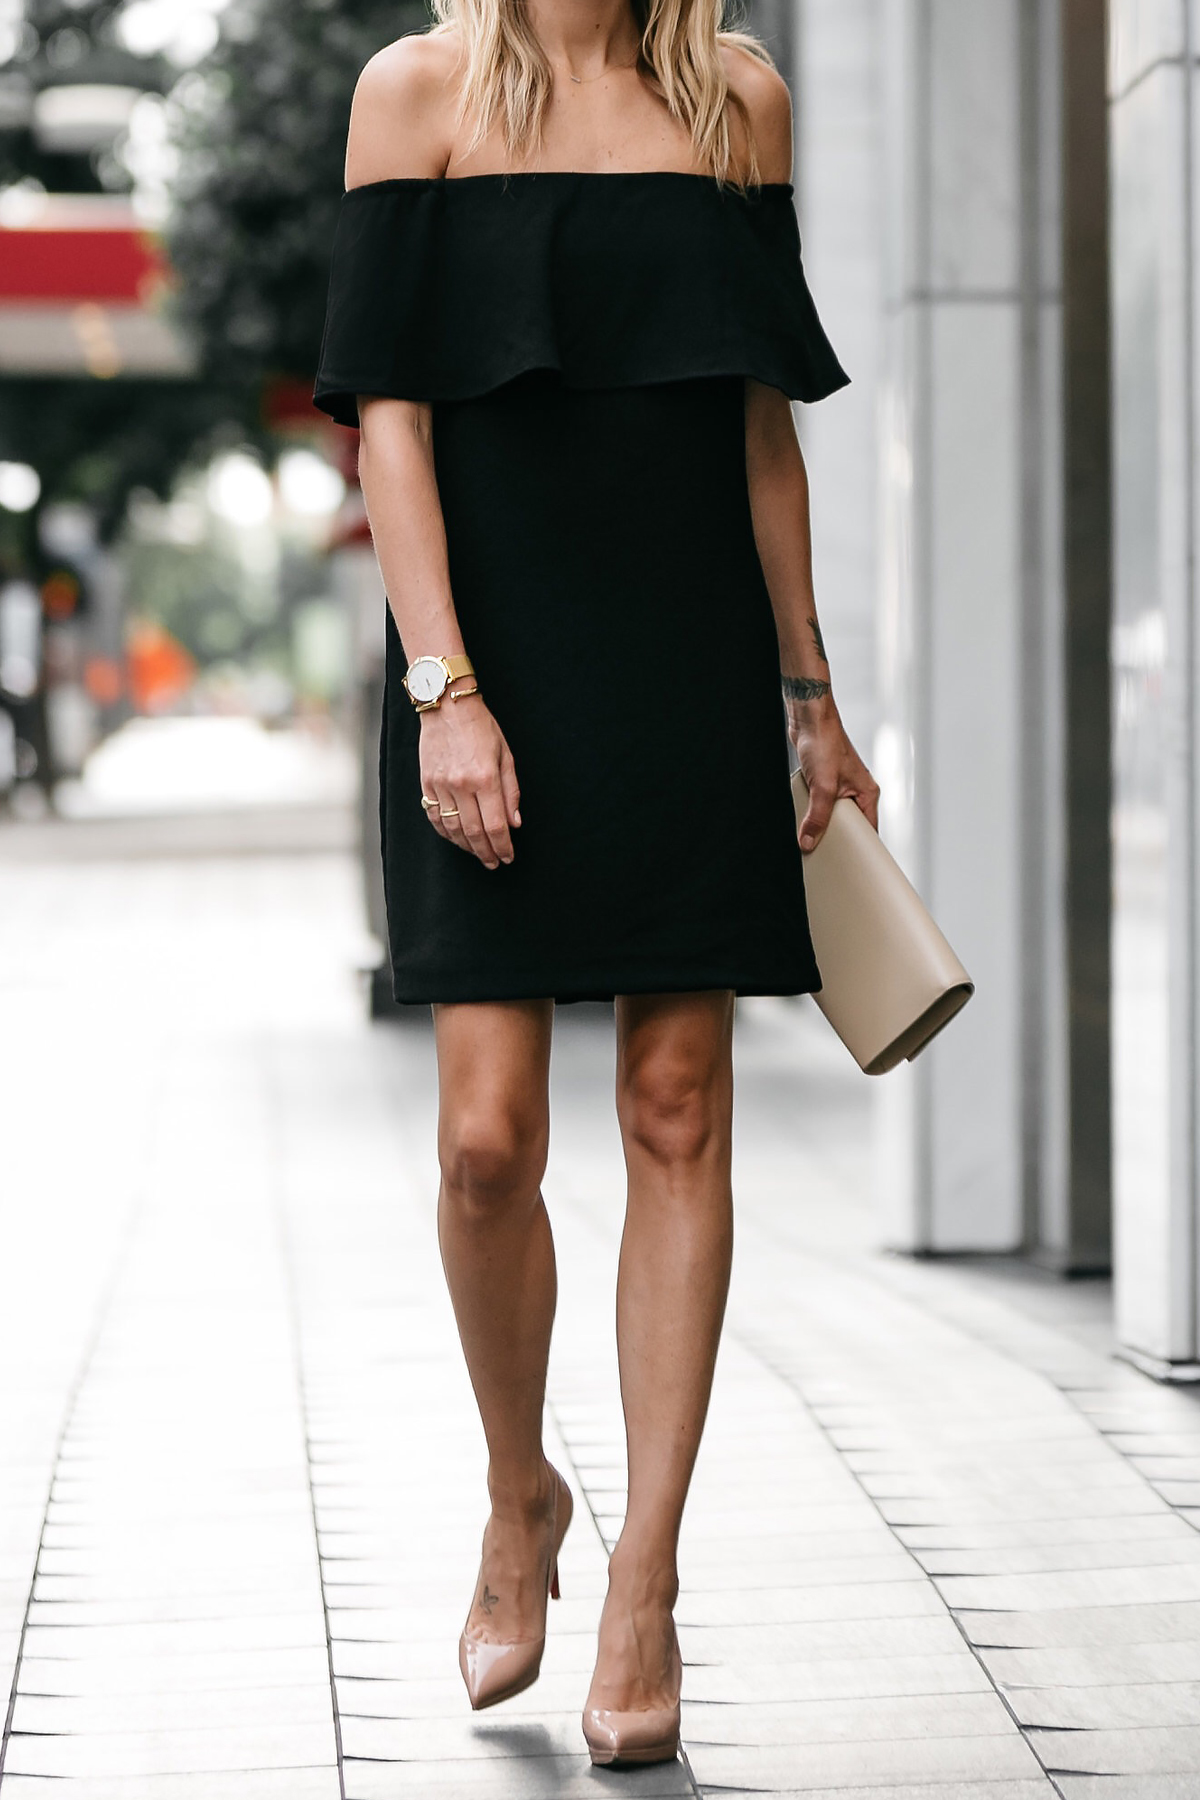 Nordstrom off the shoulder black dress YSL nude clutch christian louboutin nude pumps little black dress street style dallas blogger fashion blogger